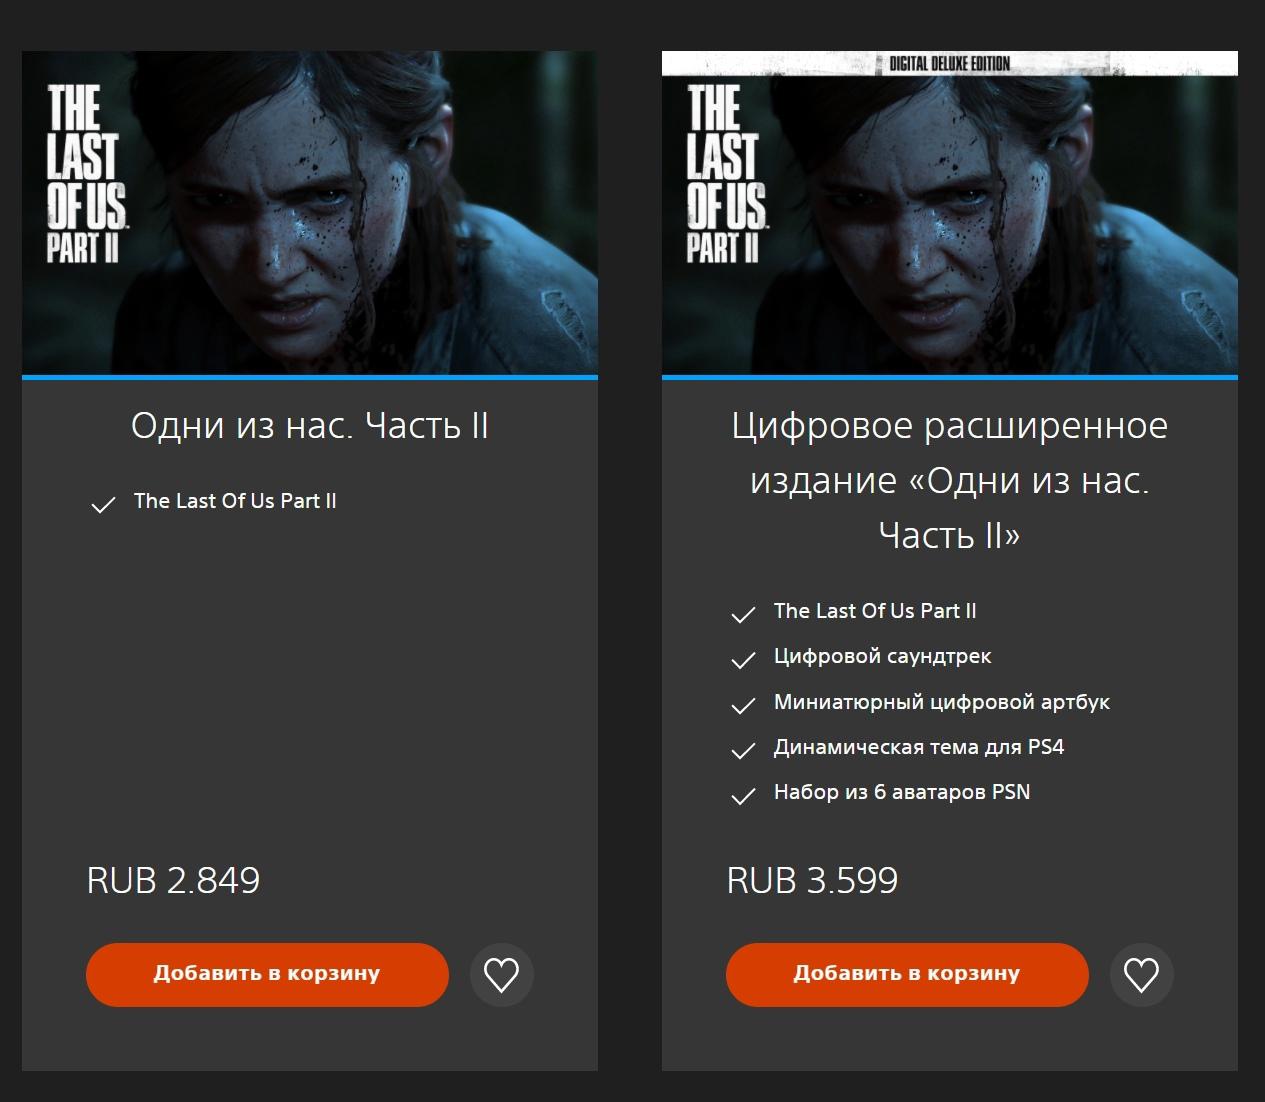 Вслед за американским в европейском PS Store, включая Россию, снизилась цена на The Last of Us Part 2